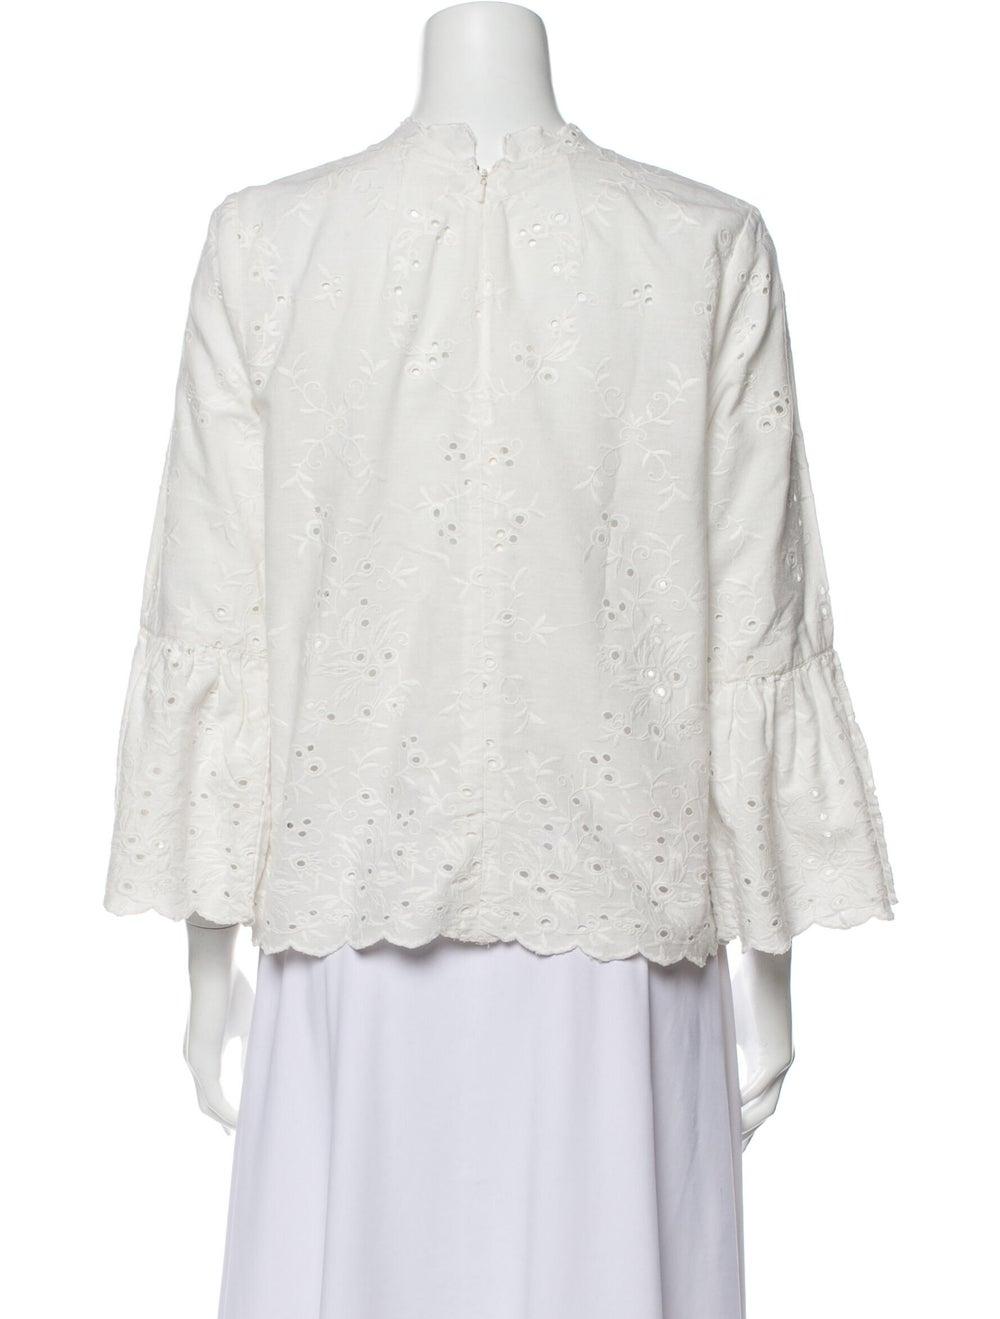 Ulla Johnson Lace Pattern Mock Neck Blouse White - image 3